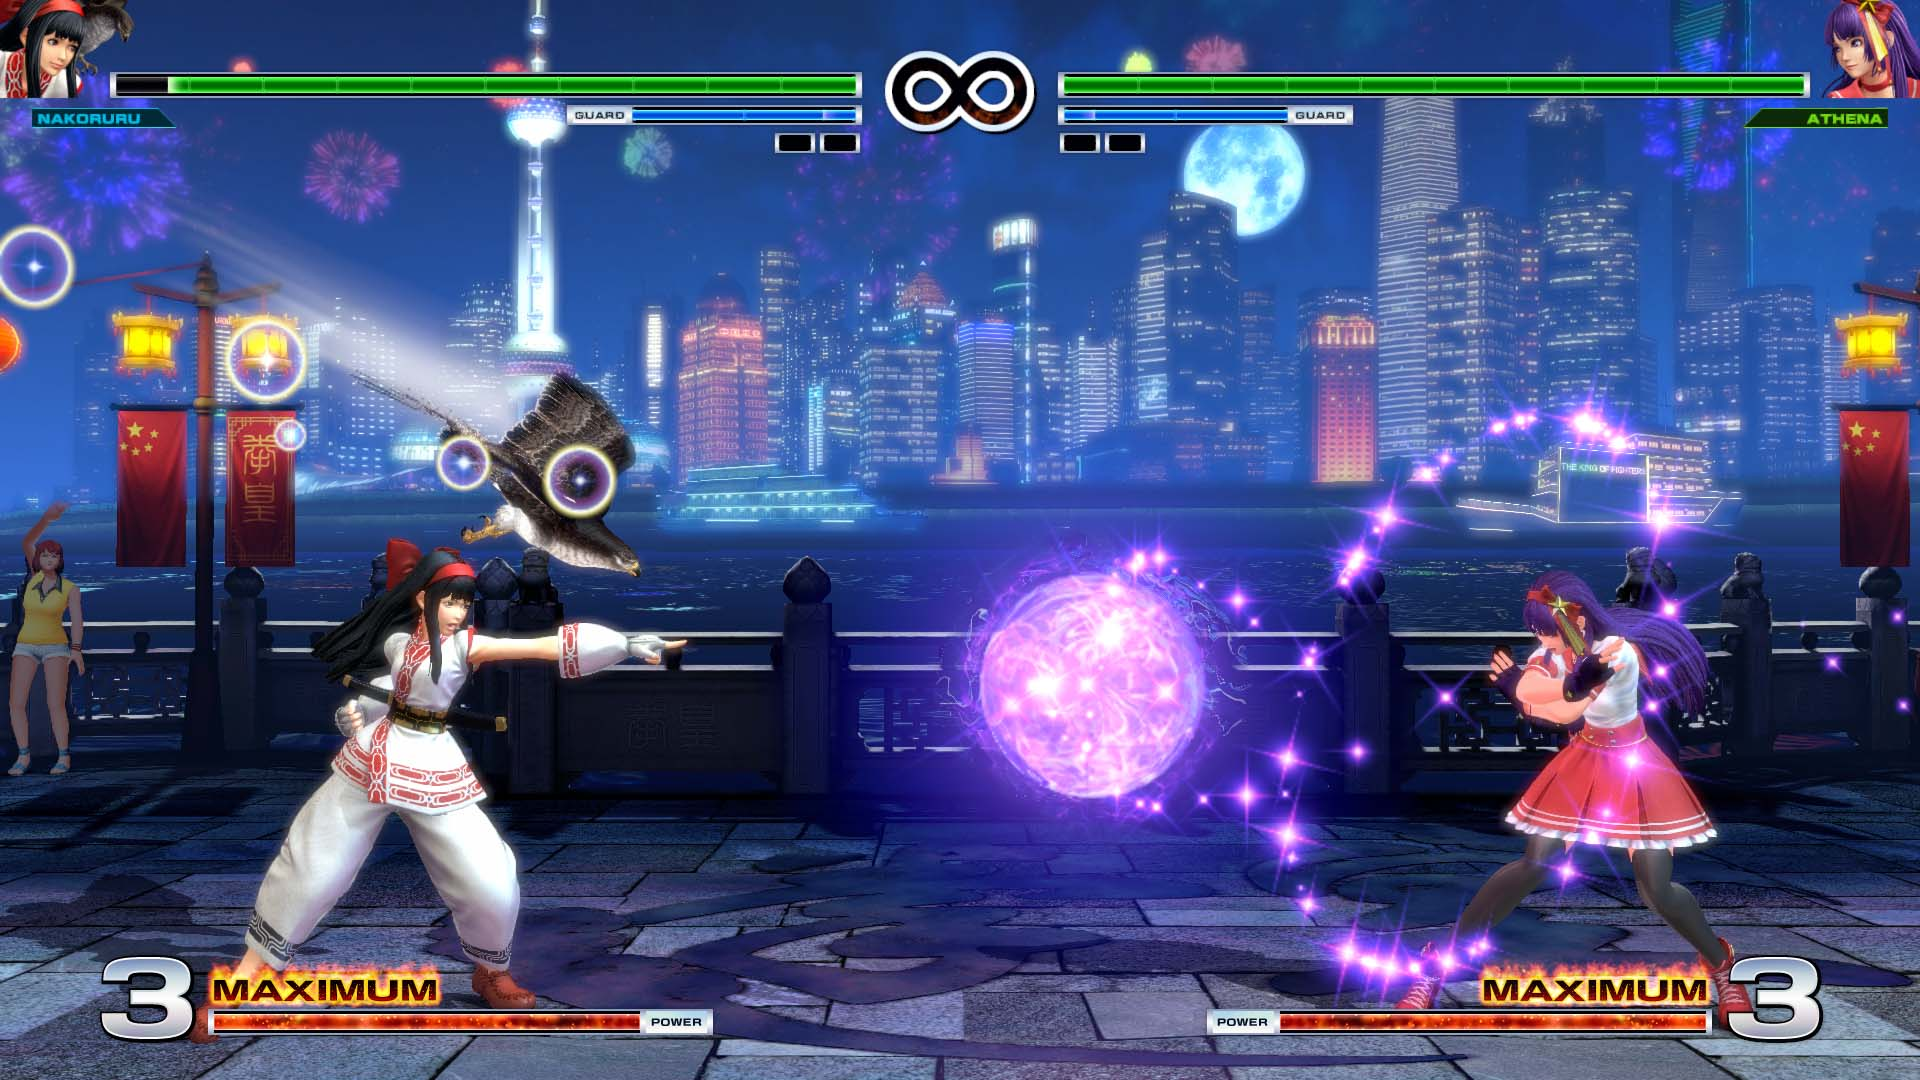 KOFXIV - Nakoruru vs Athena